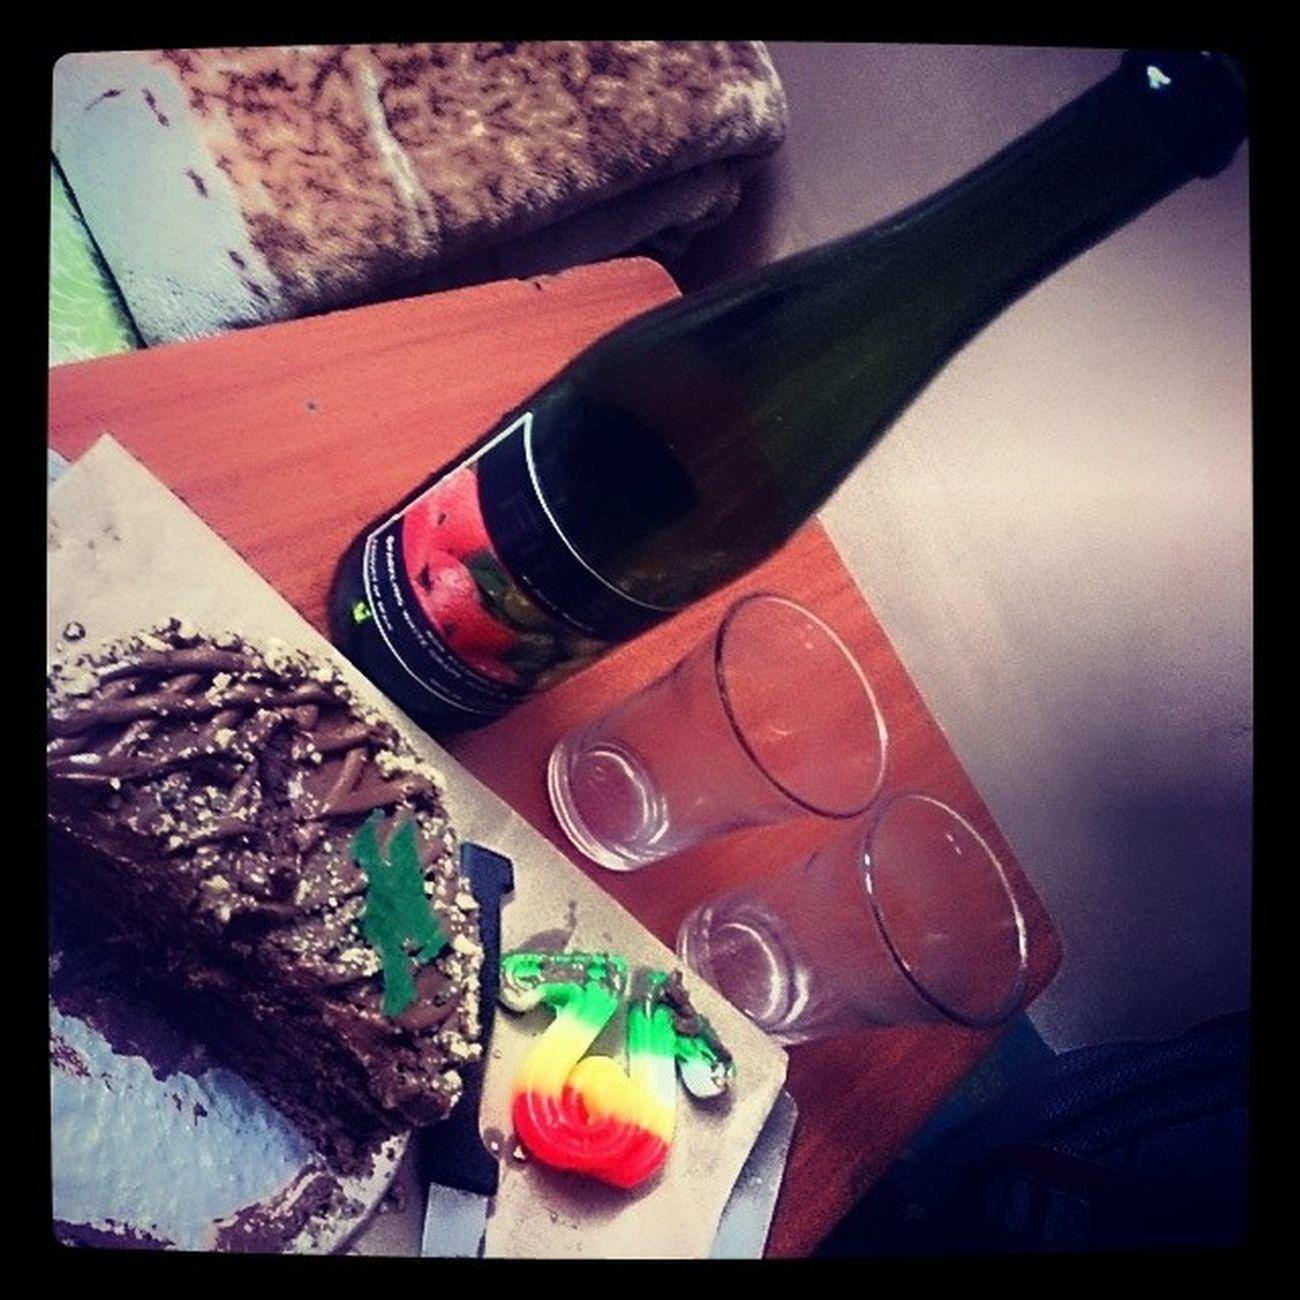 Celebrating best buddies bday Friends Fun Love Like Party Tonite Cake Drinks Nonalcoholic Wine Dinner